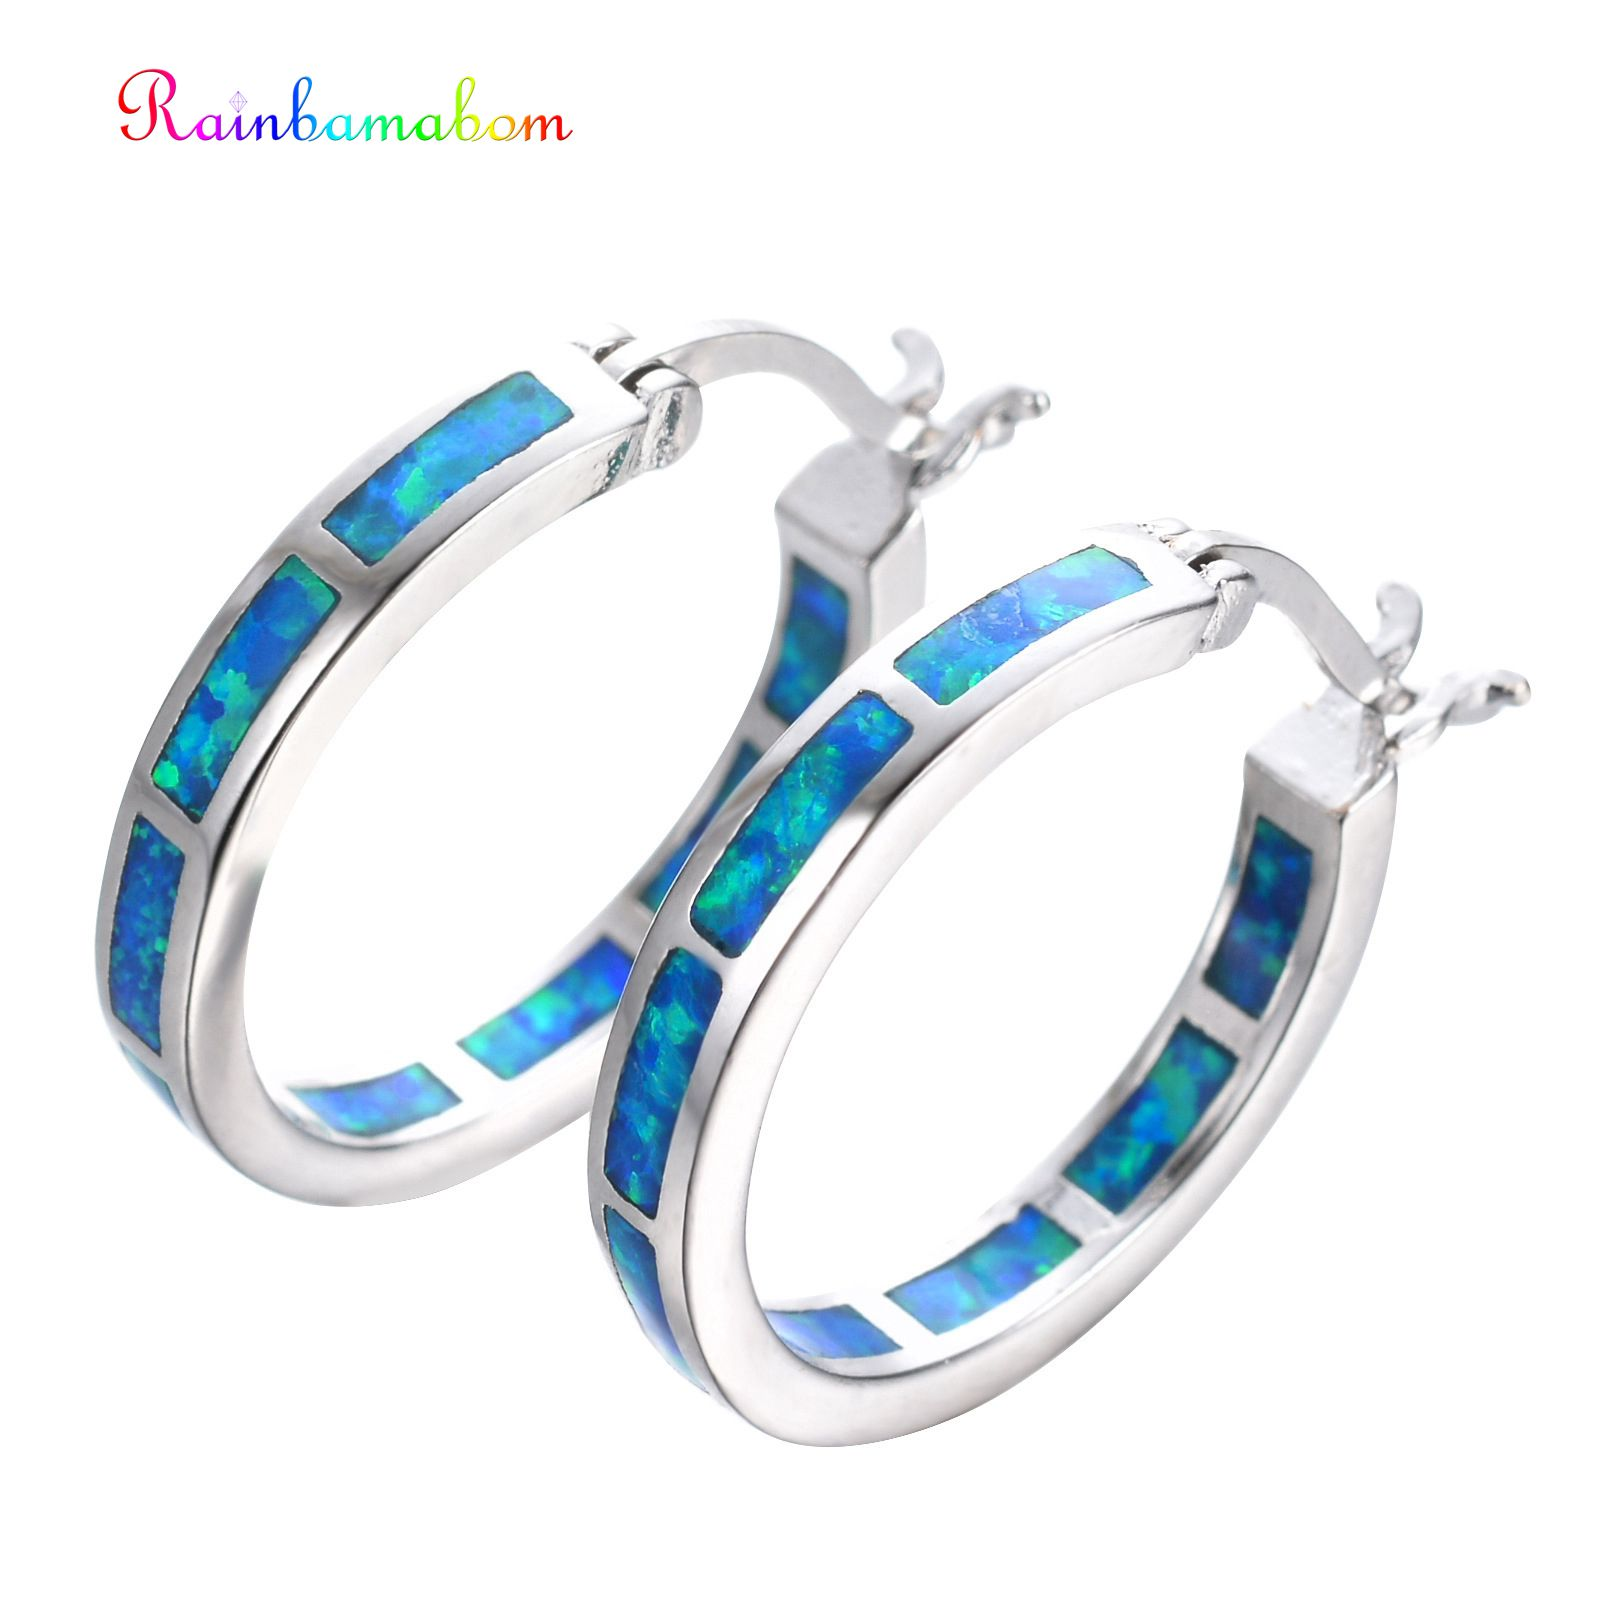 Rainbamabom Real 925 Solid Sterling Silver Opal Gemstone White Gold Hoop Earrings Engagement Wedding Fine Jewelry Gift Wholesale